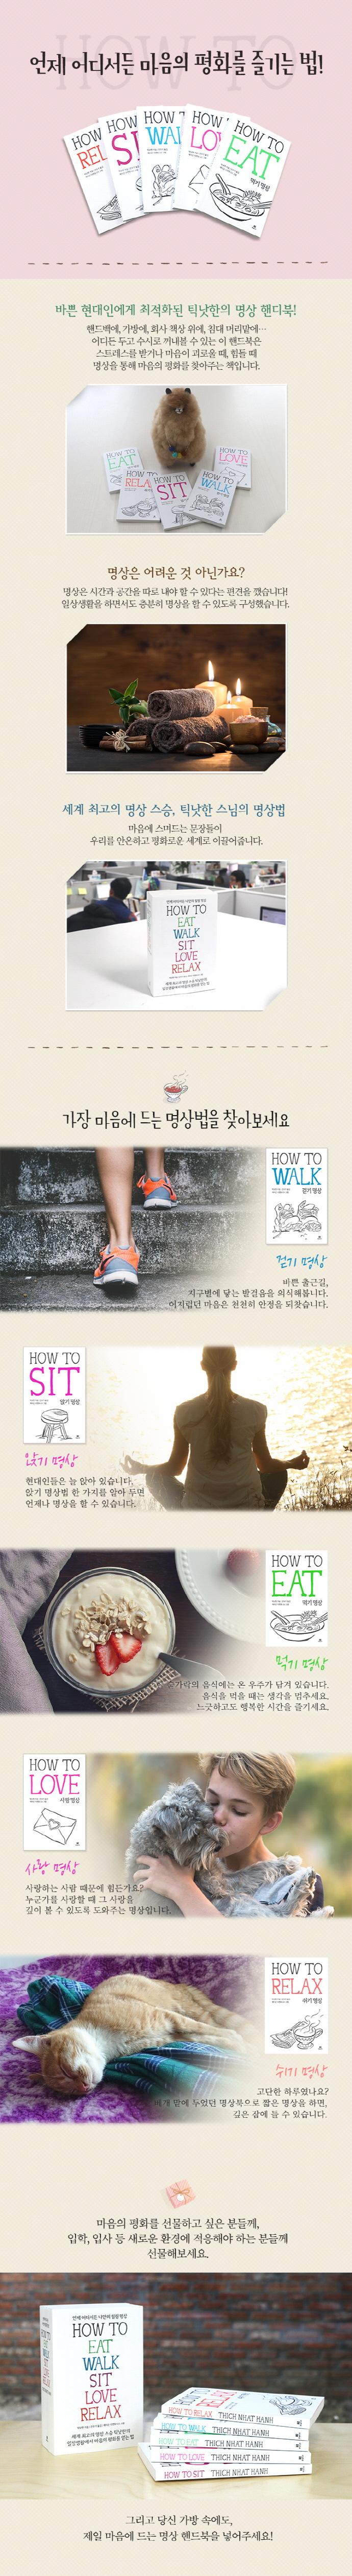 How To 세트:Eat, Walk, Sit, Love, Relax(틱낫한의 How To 시리즈)(전5권) 도서 상세이미지